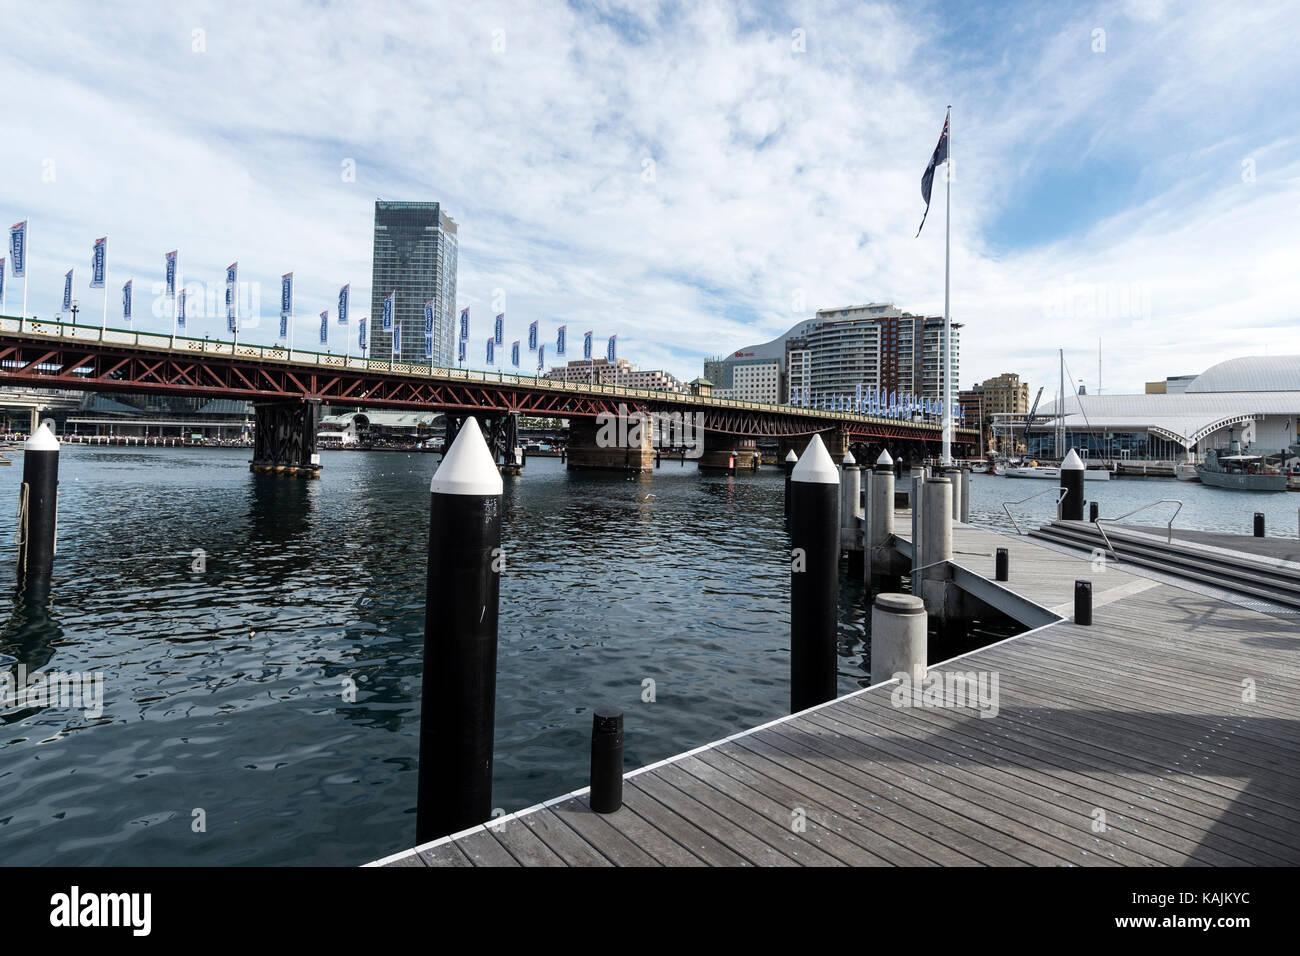 Pyrmont Bridge across Darling Harbour in Sydney, New South Wales, Australia - Stock Image